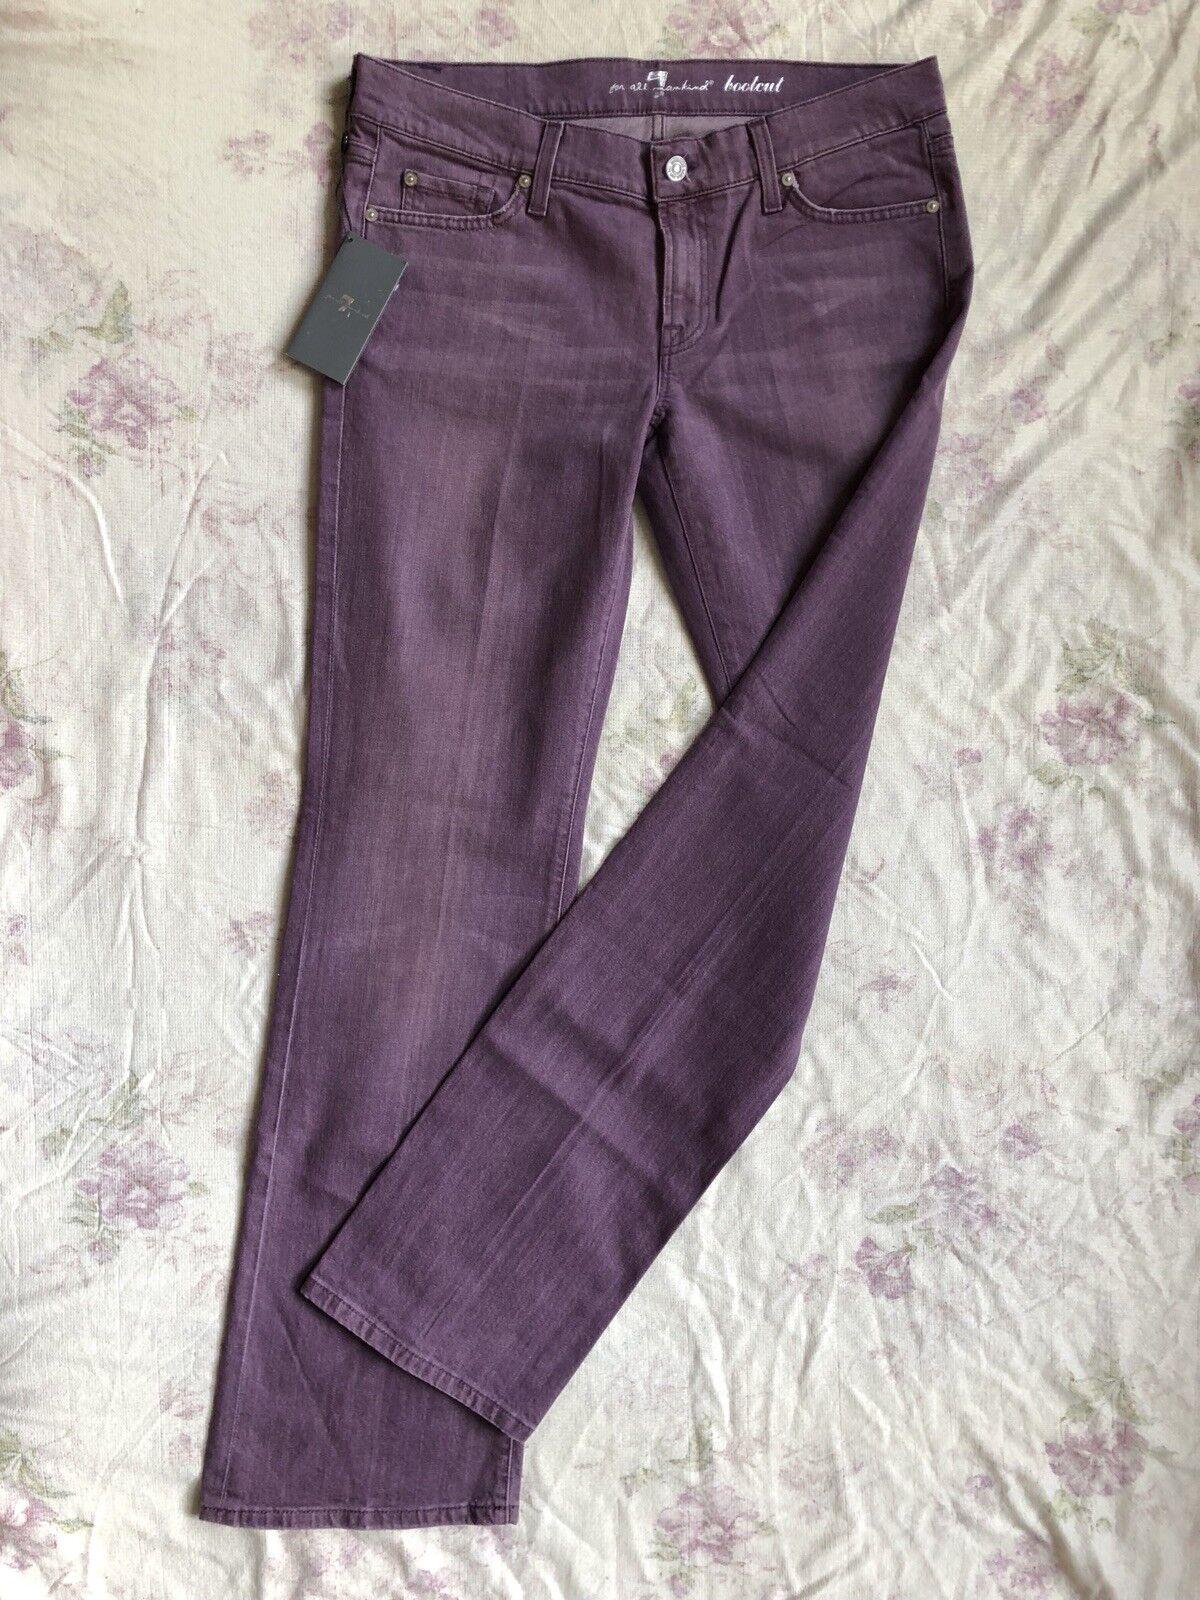 7 Seven For All Mankind avviocut jeans stretch w32 l34 X-LOW WAIST regular fit